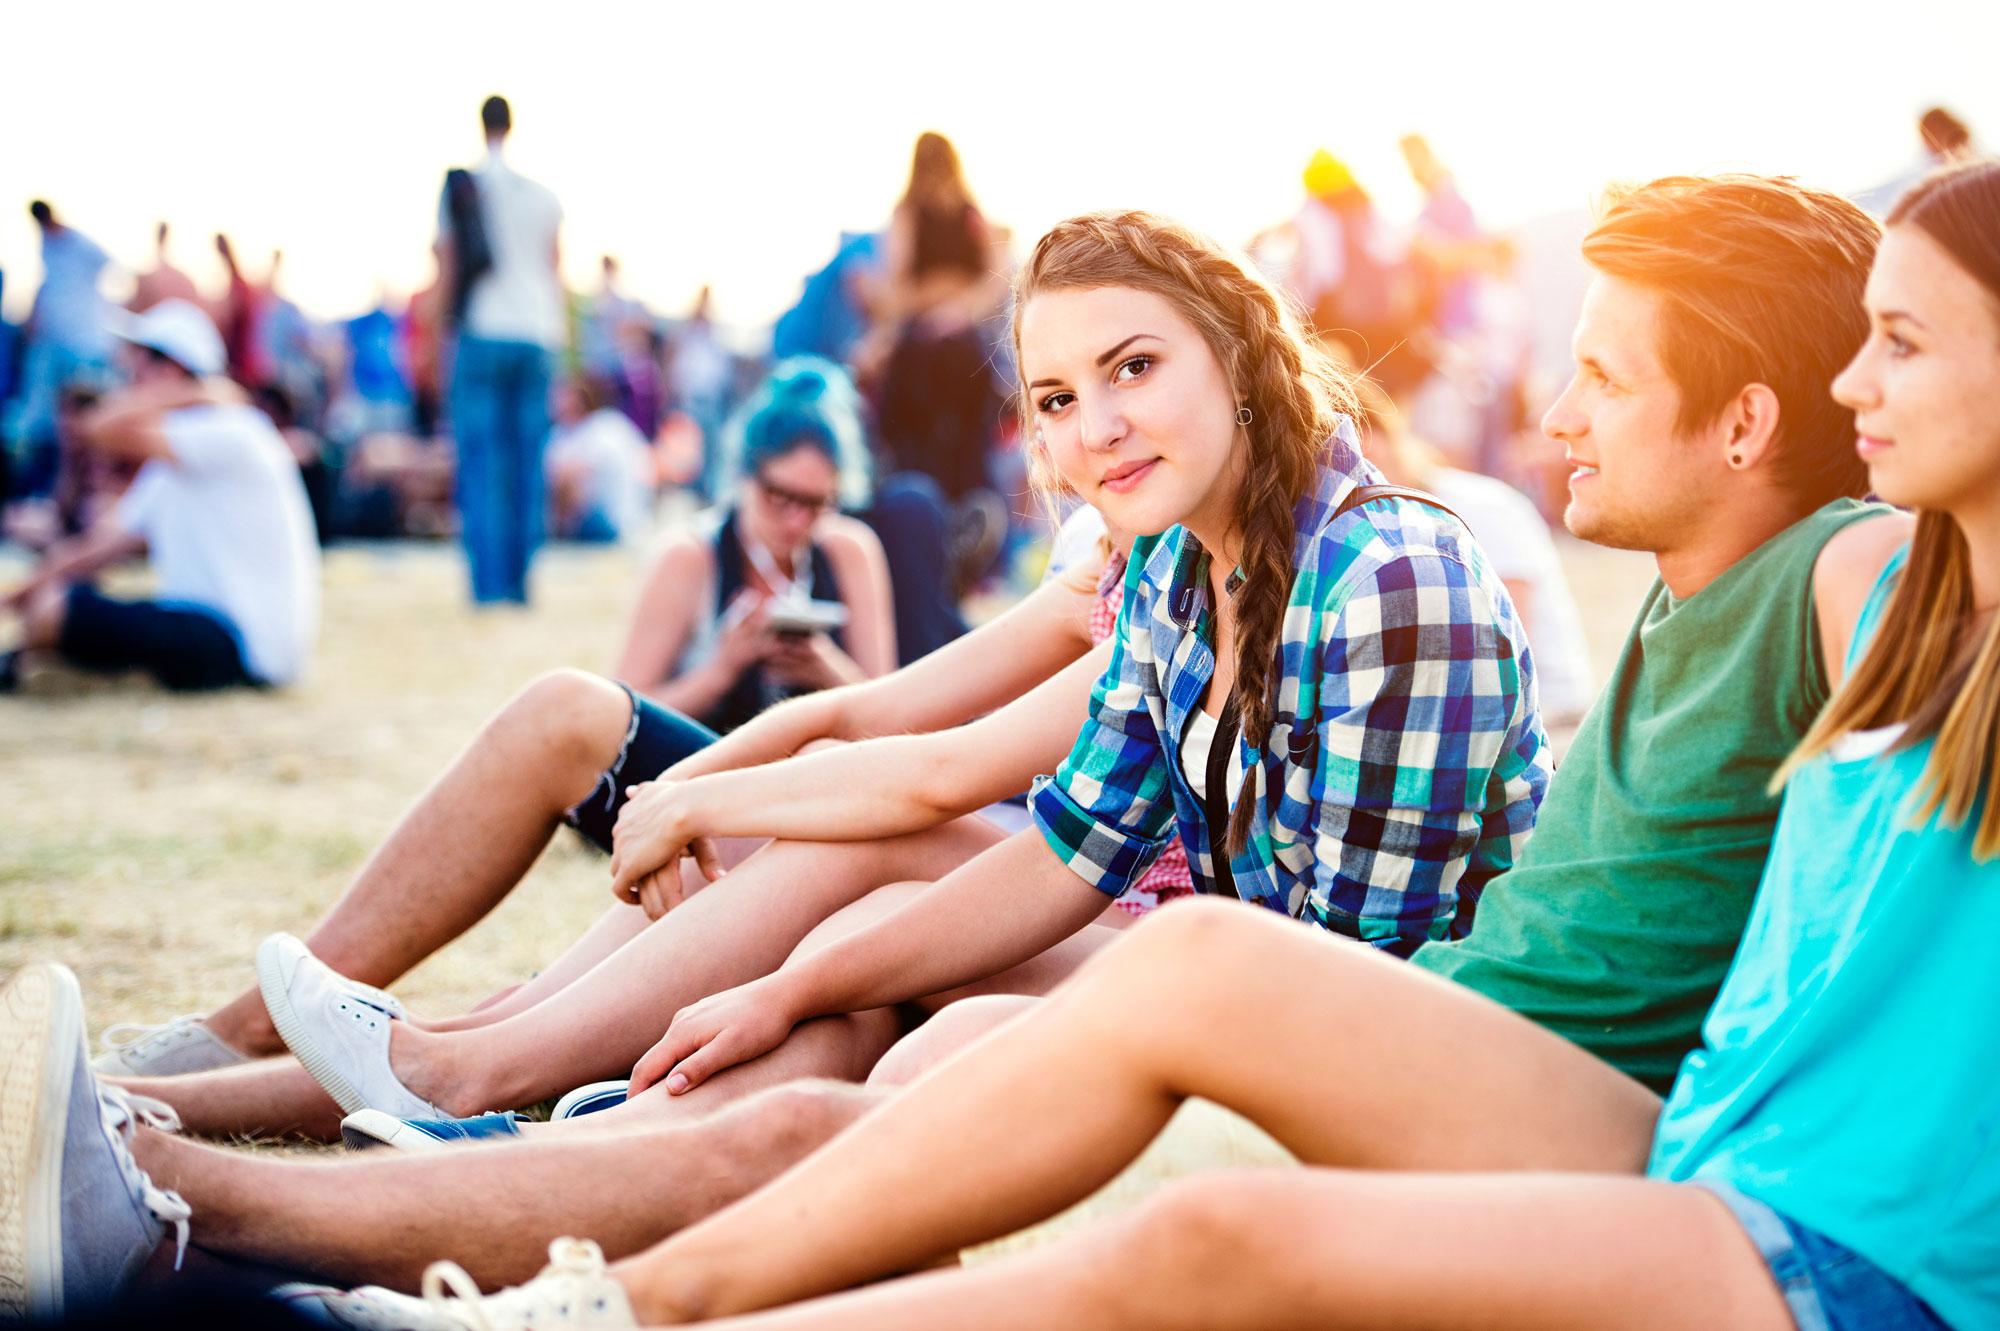 bigstock-Teenagers-at-summer-music-fest-121970183WEB.jpg